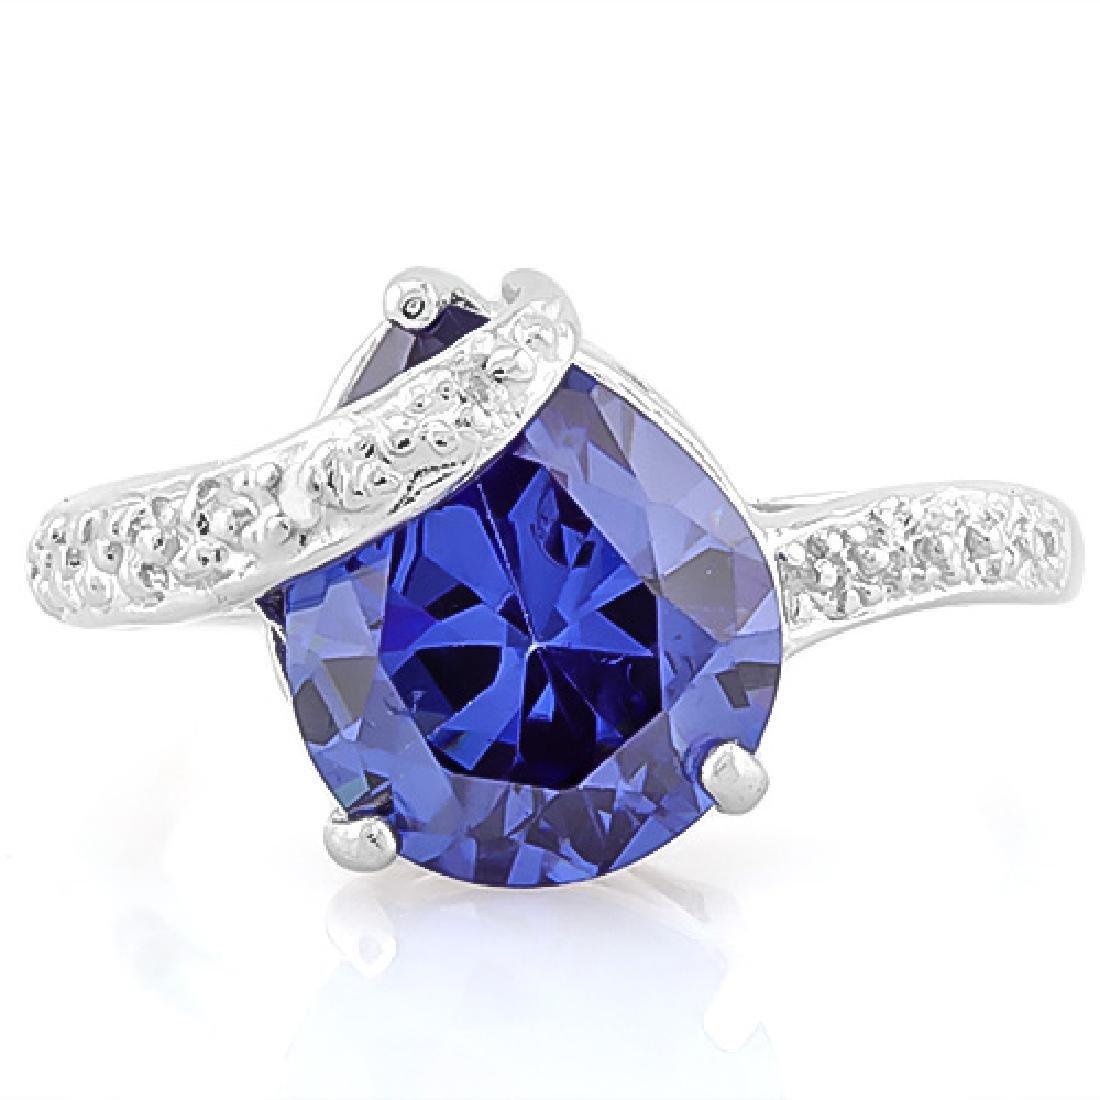 5 CARAT LAB TANZANITE & DIAMOND 925 STERLING SILVER RIN